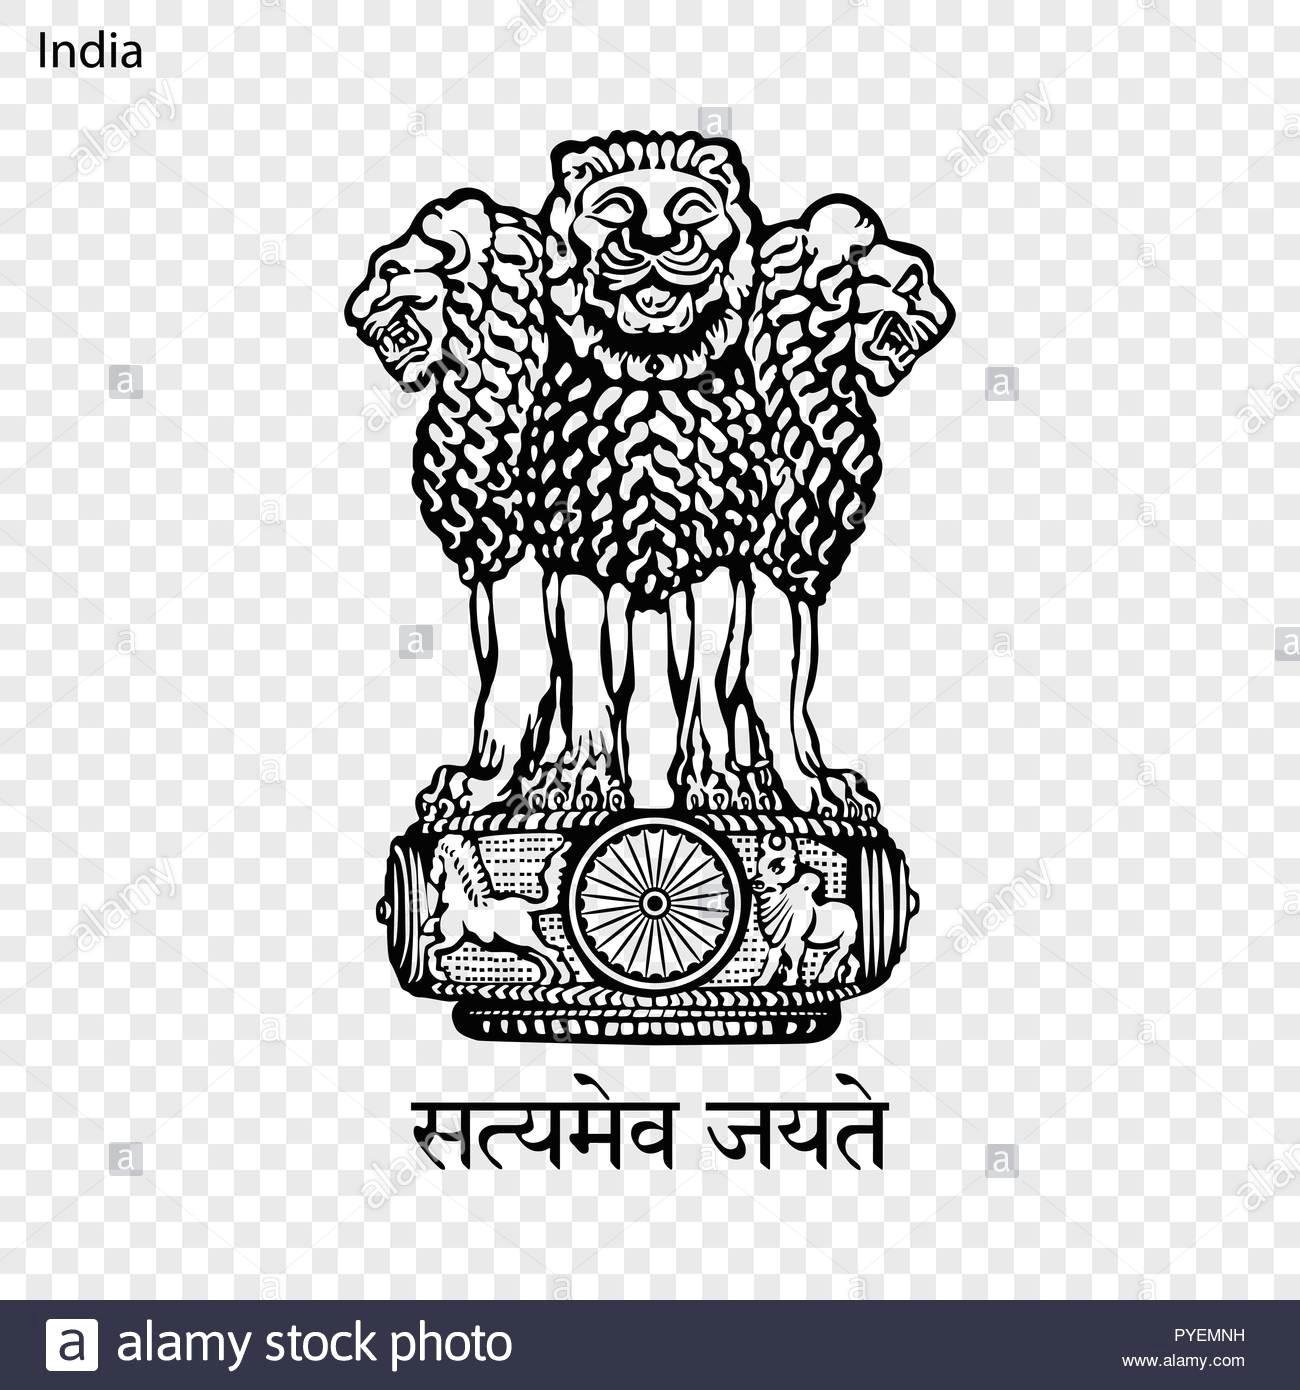 symbol of india national emblem pyemnh jpg